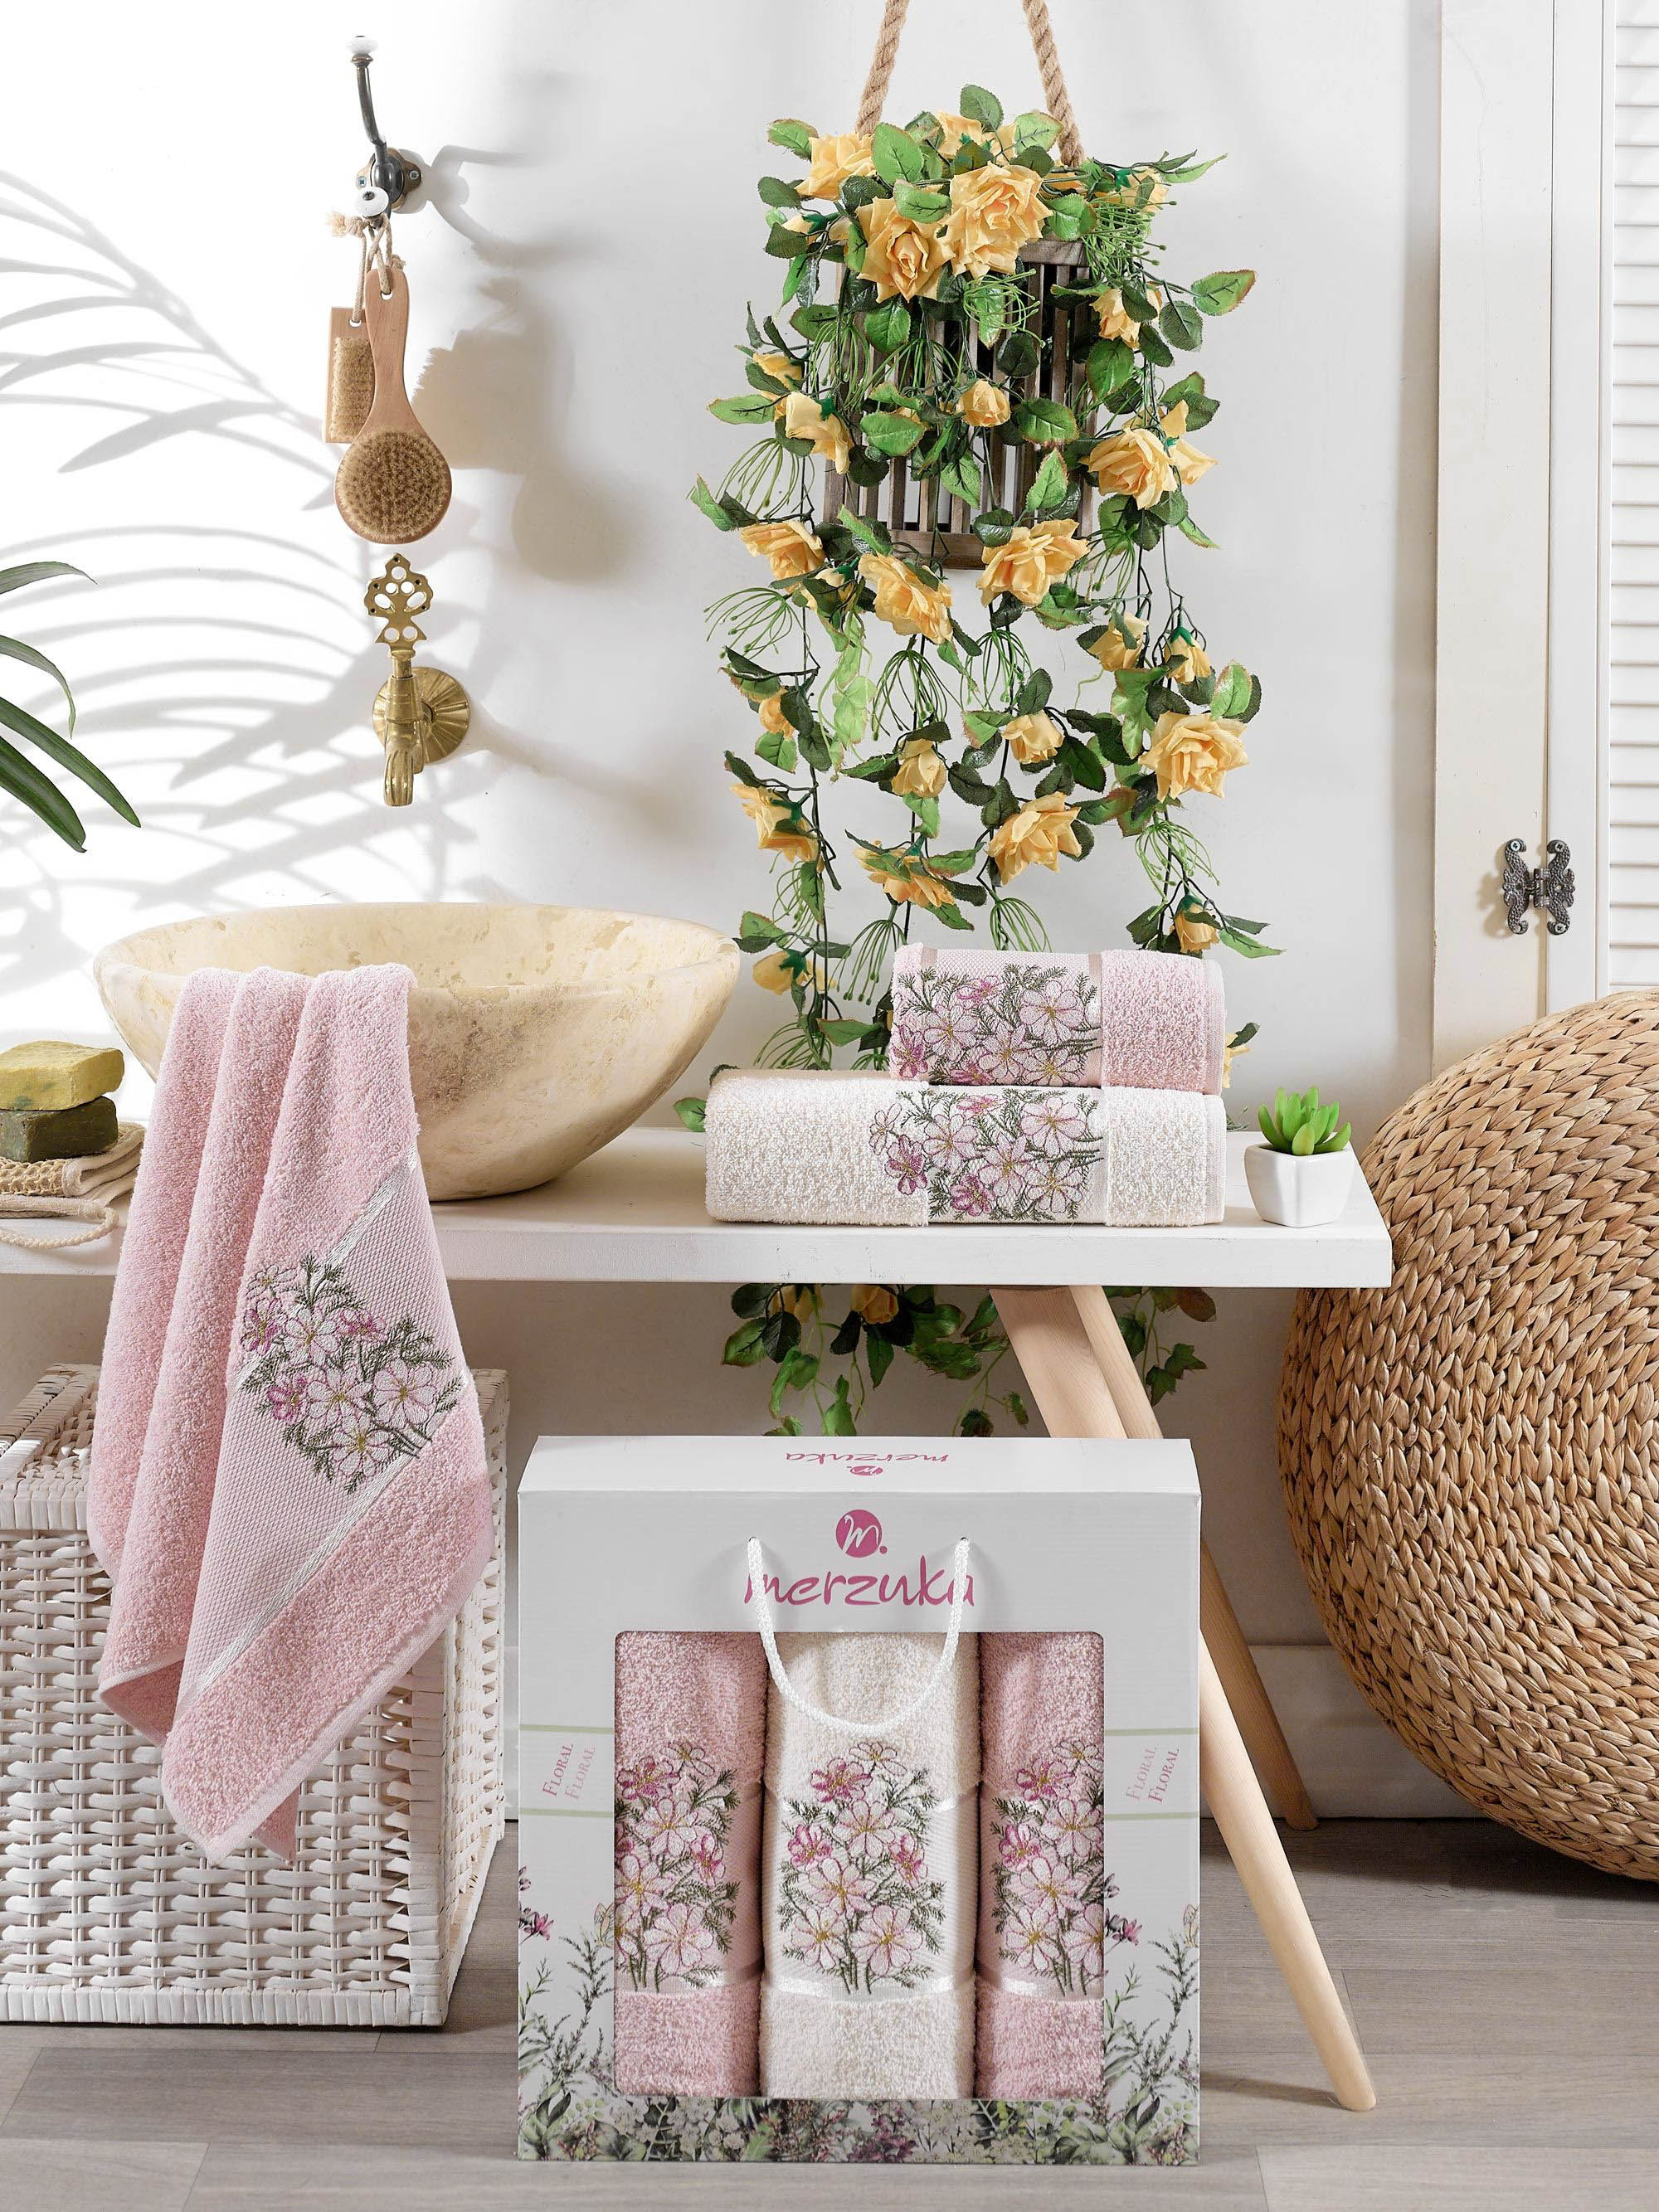 Полотенца Oran Merzuka Полотенце Floral Цвет: Светло-Розовый (50х80 см - 2 шт,70х130 см) набор из 3 полотенец merzuka sakura 50х90 2 70х140 8432 оранжевый